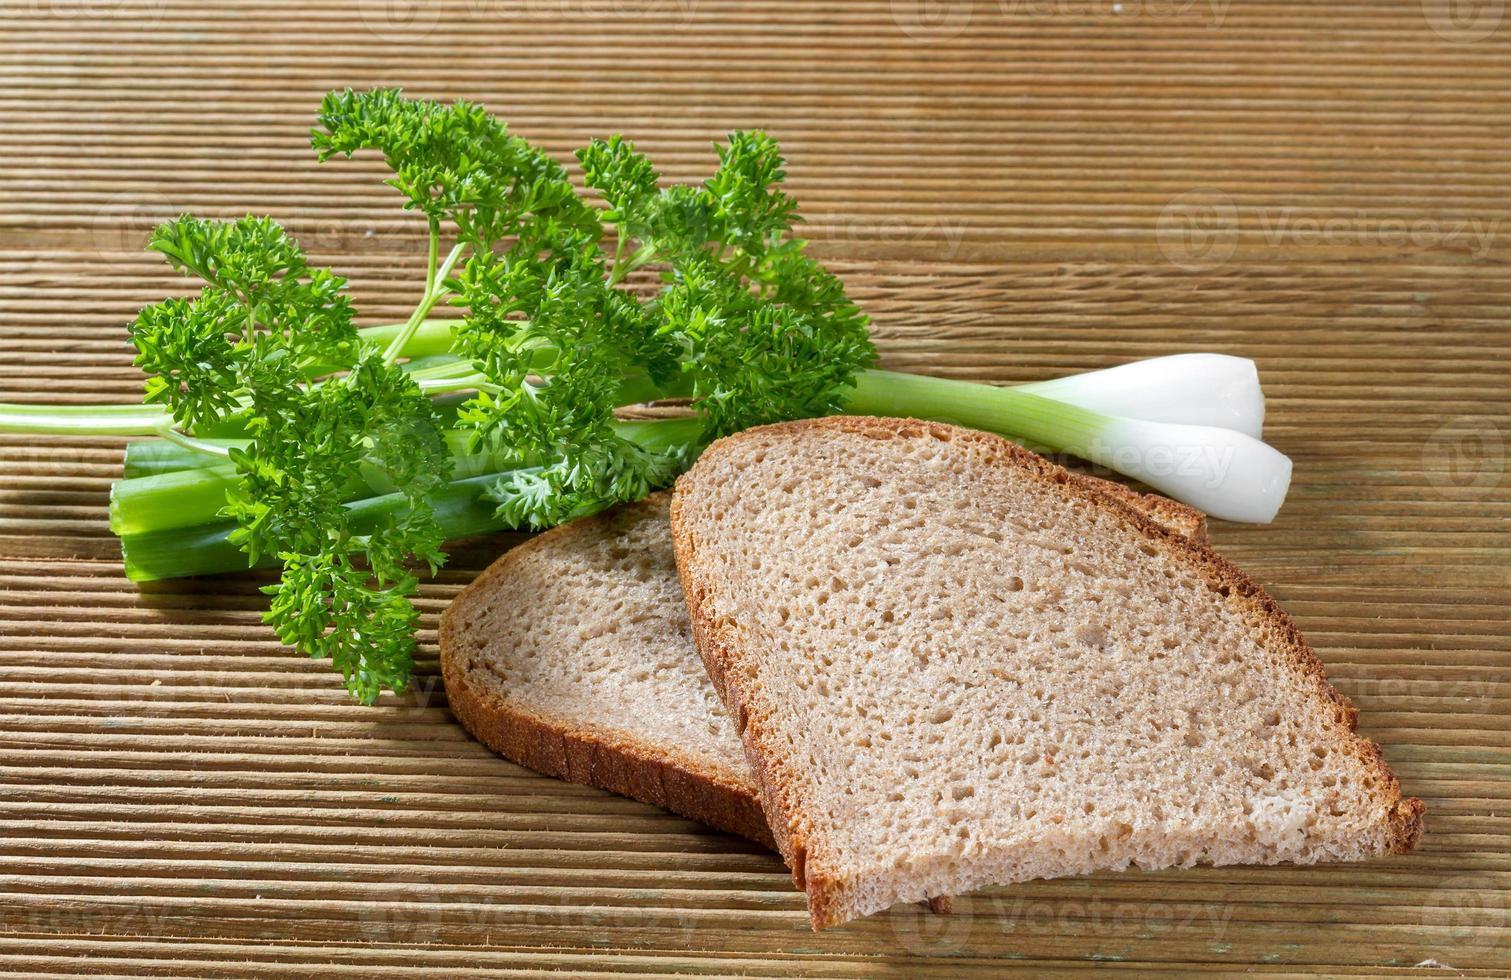 zwart brood met groene uien foto